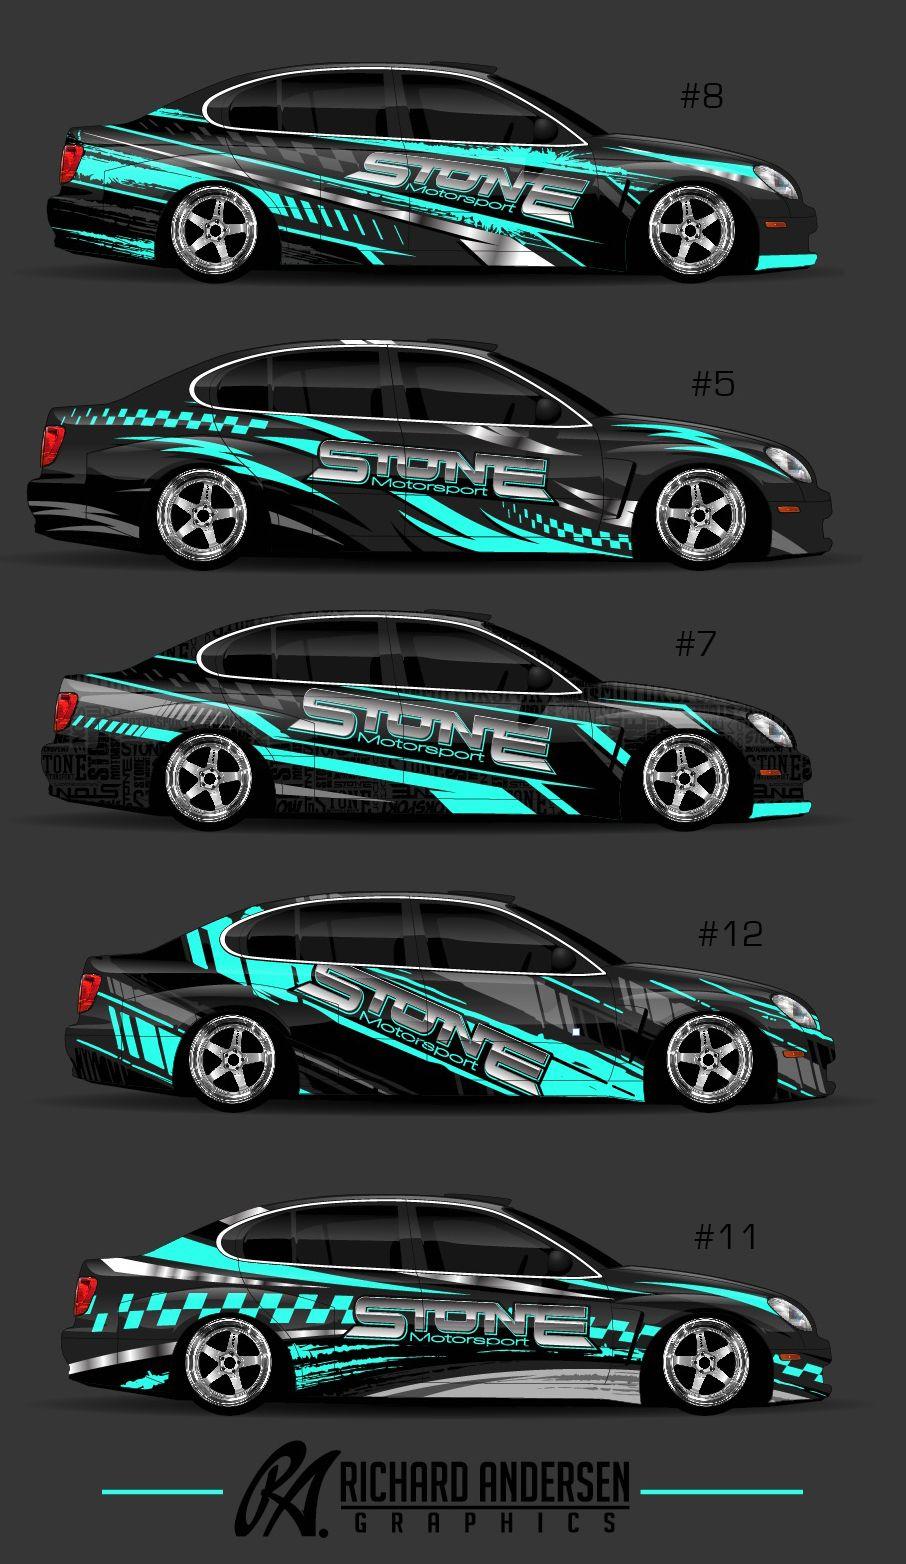 Race car sticker design - Wrap Design By Richard Andersen Https Ragraphics Carbonmade Com Vehicle Wrapsracingstickersadvertising